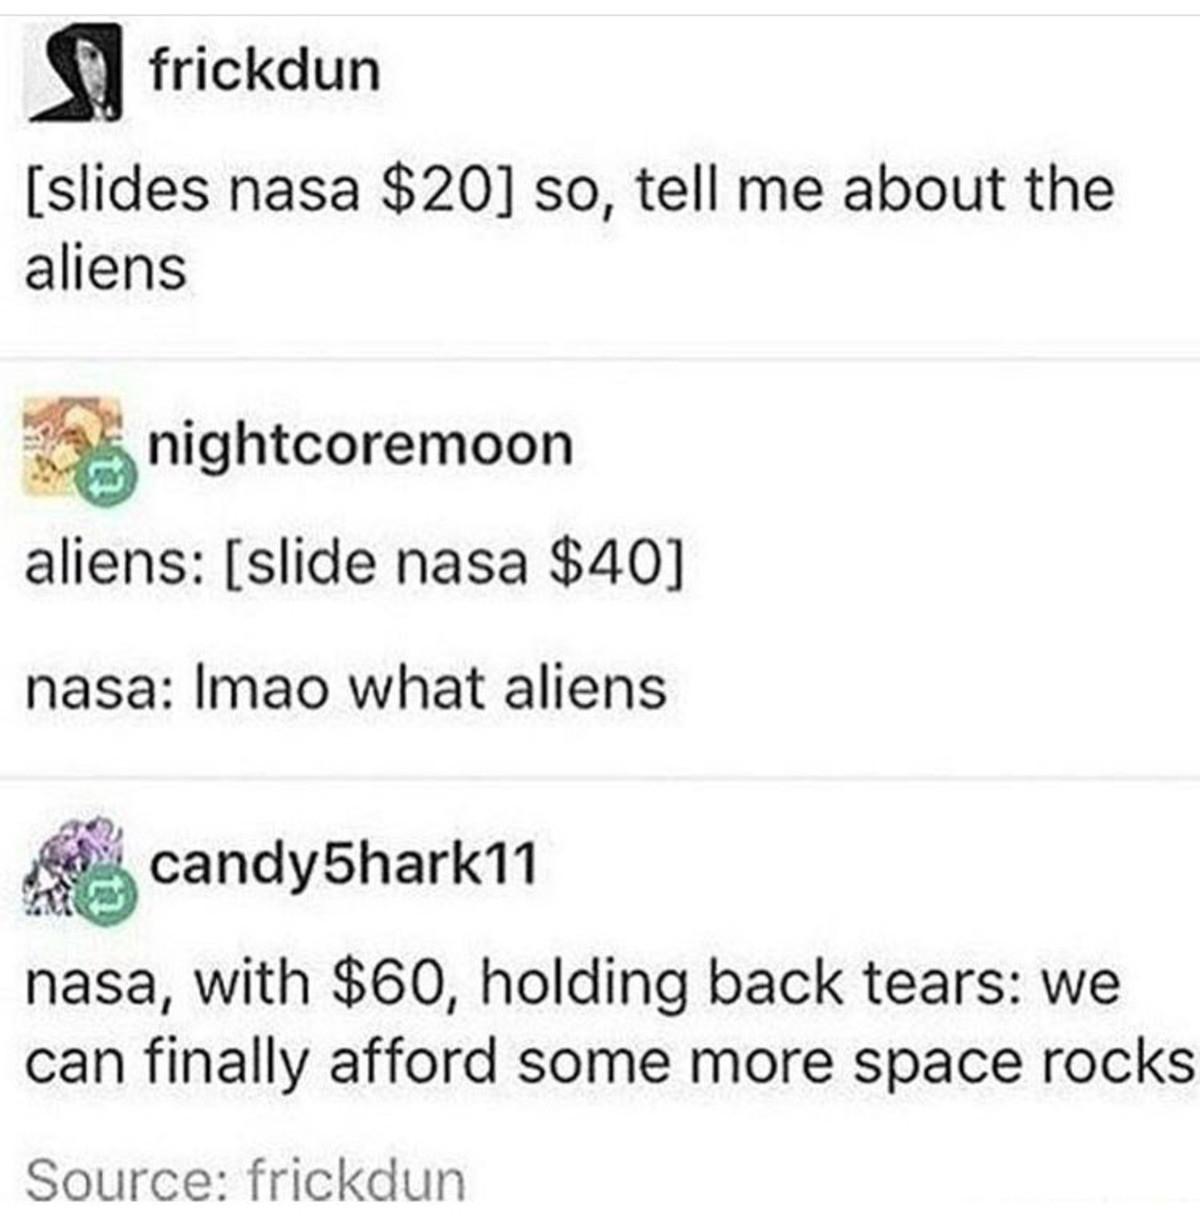 nasa say nada. . slides nasa ] so, tell rne about the aliens f! luiigii; nightmaremoon aliens:  nasa: lmao what aliens dit; nasa, with , holding ba